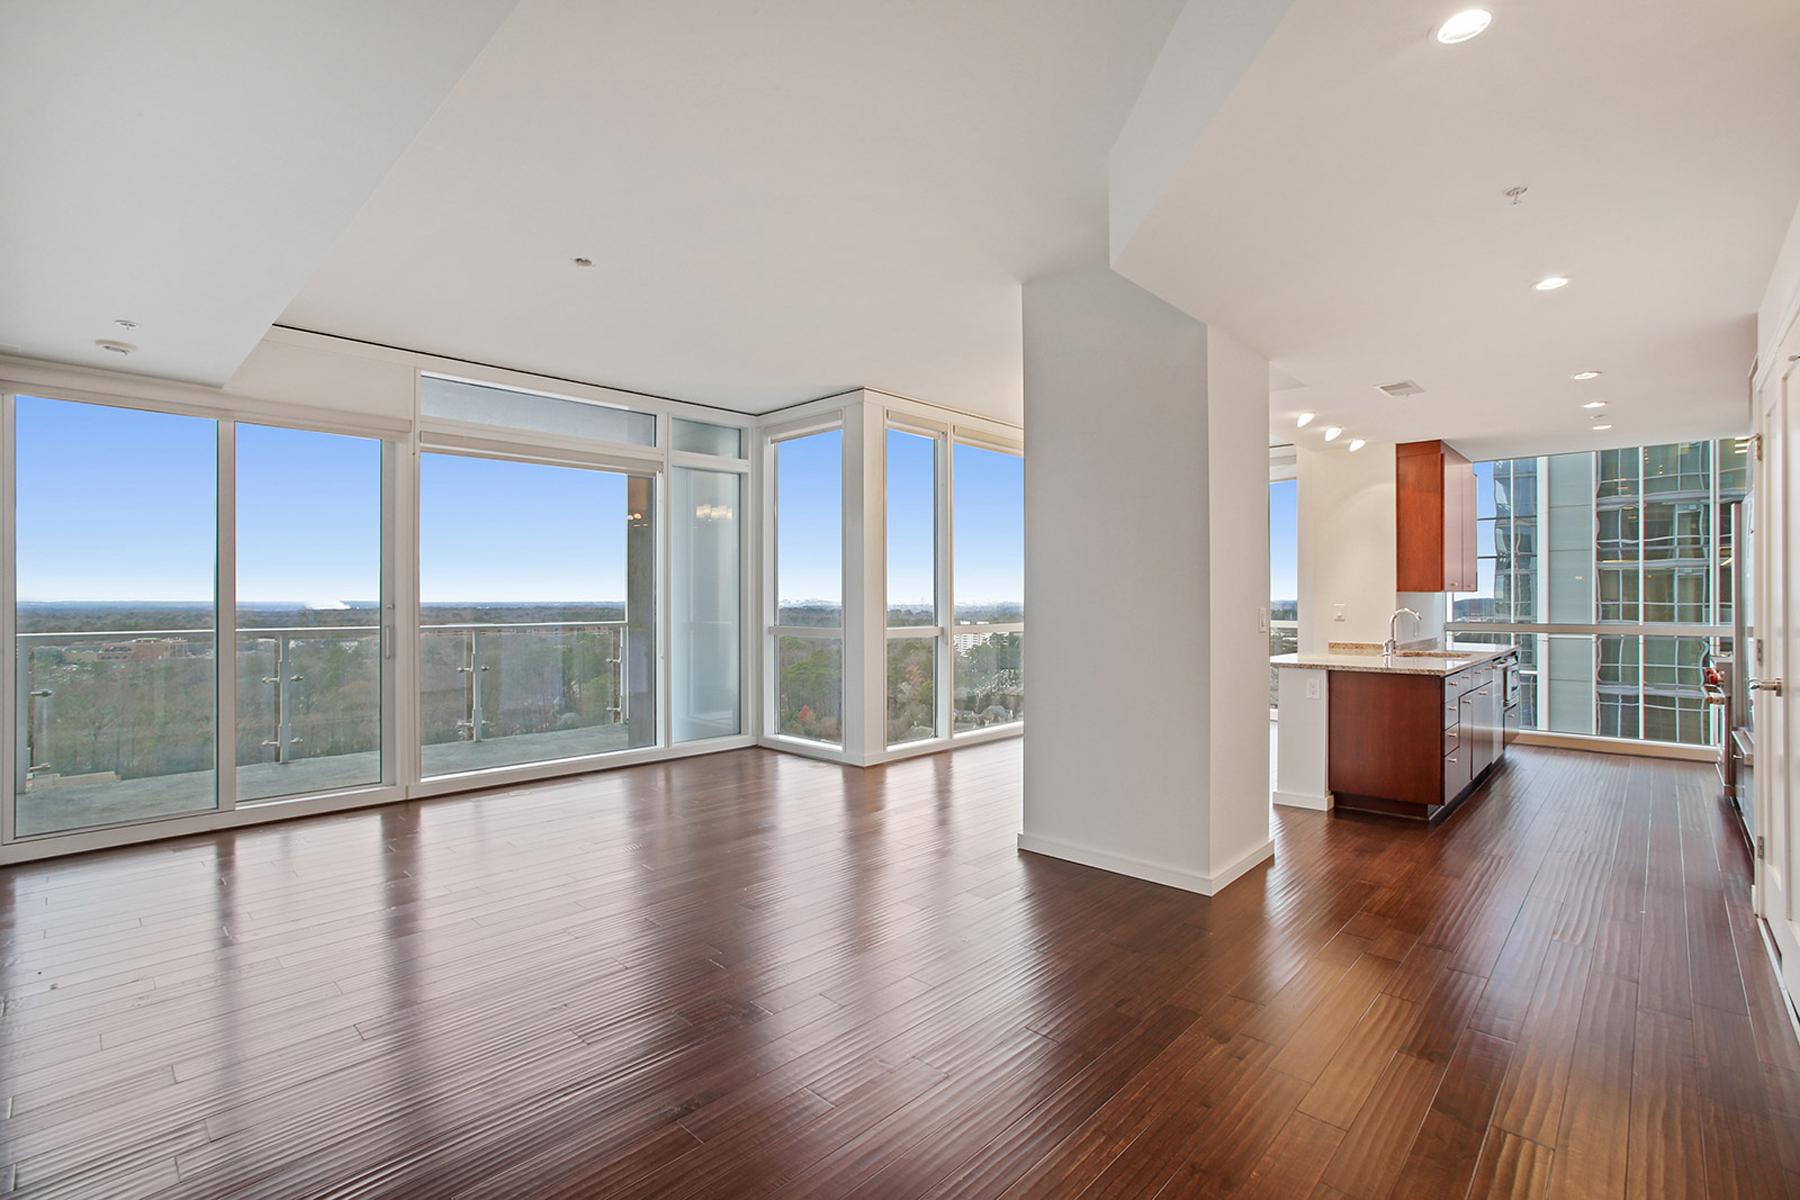 Beautifully Appointed Two Bedroom, Three Bath Condo With Stunning Views 3325 Piedmont Road NE No. 1502 Atlanta, Georgia 30305 Stati Uniti